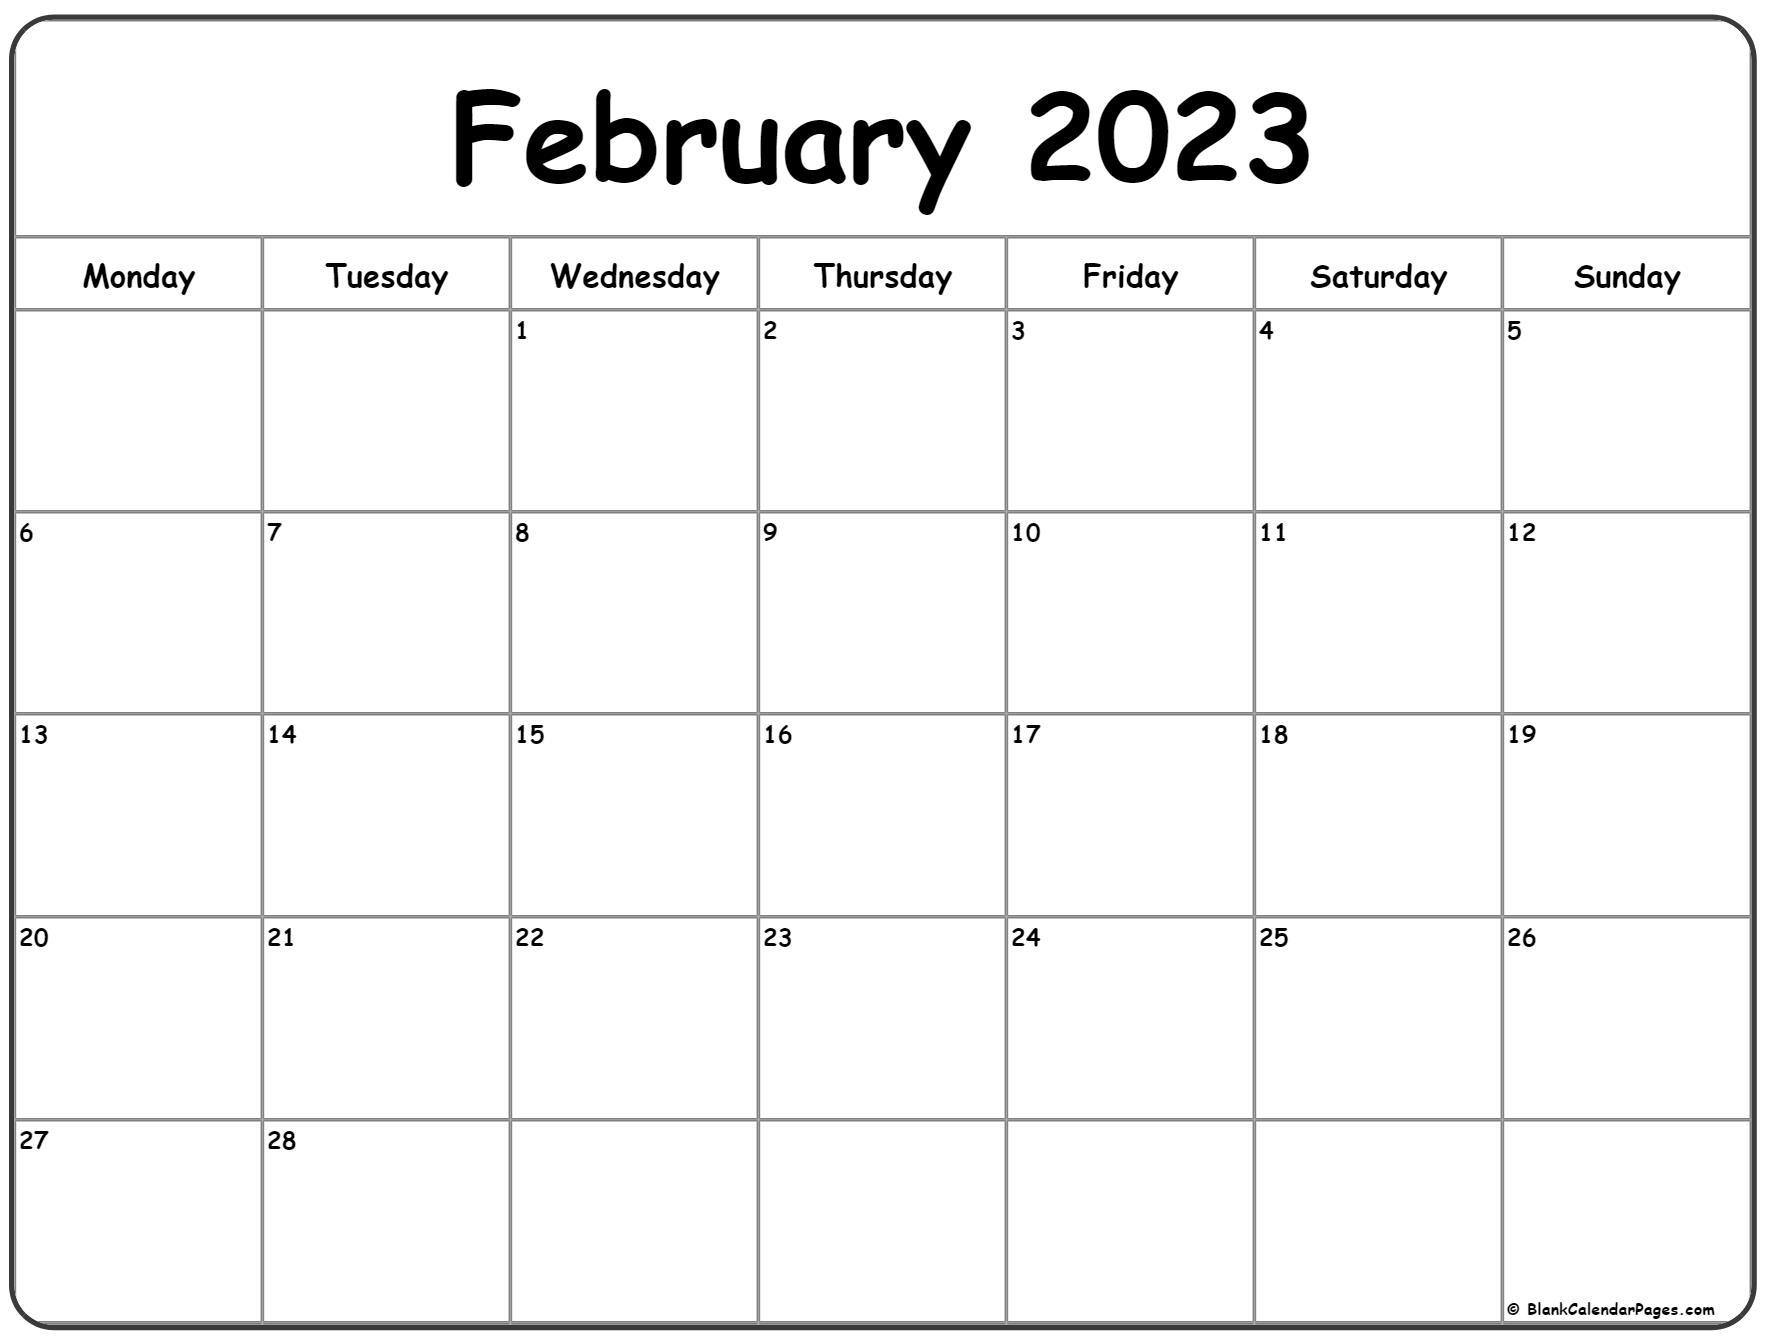 February 2023 Monday calendar. Monday to Sunday